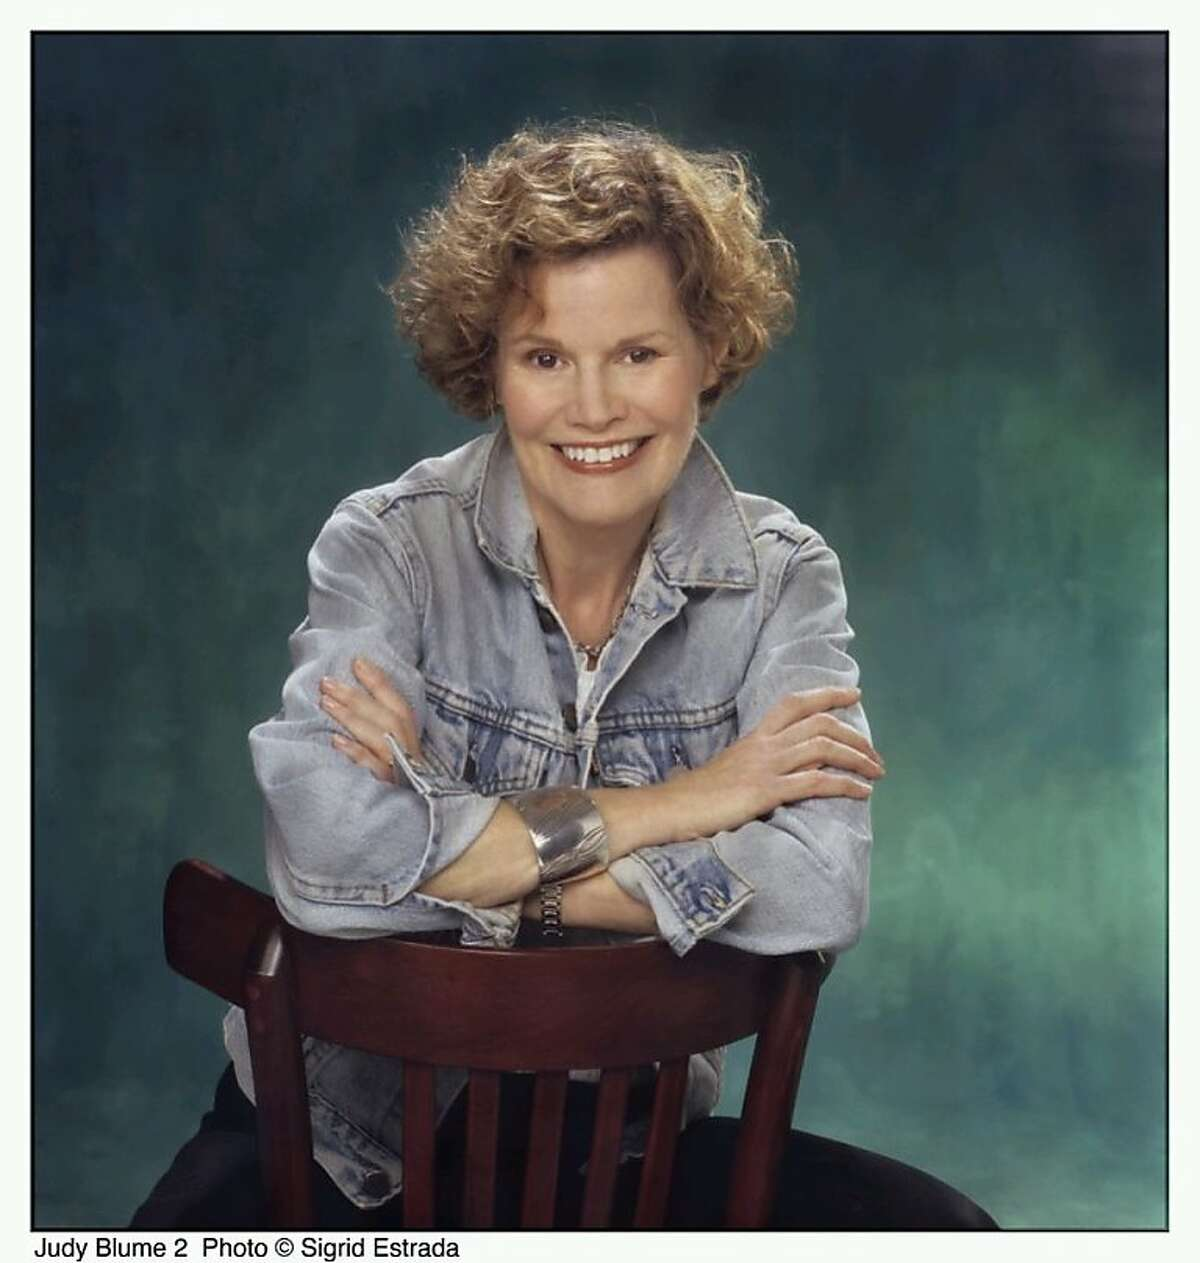 Writer Judy Blume